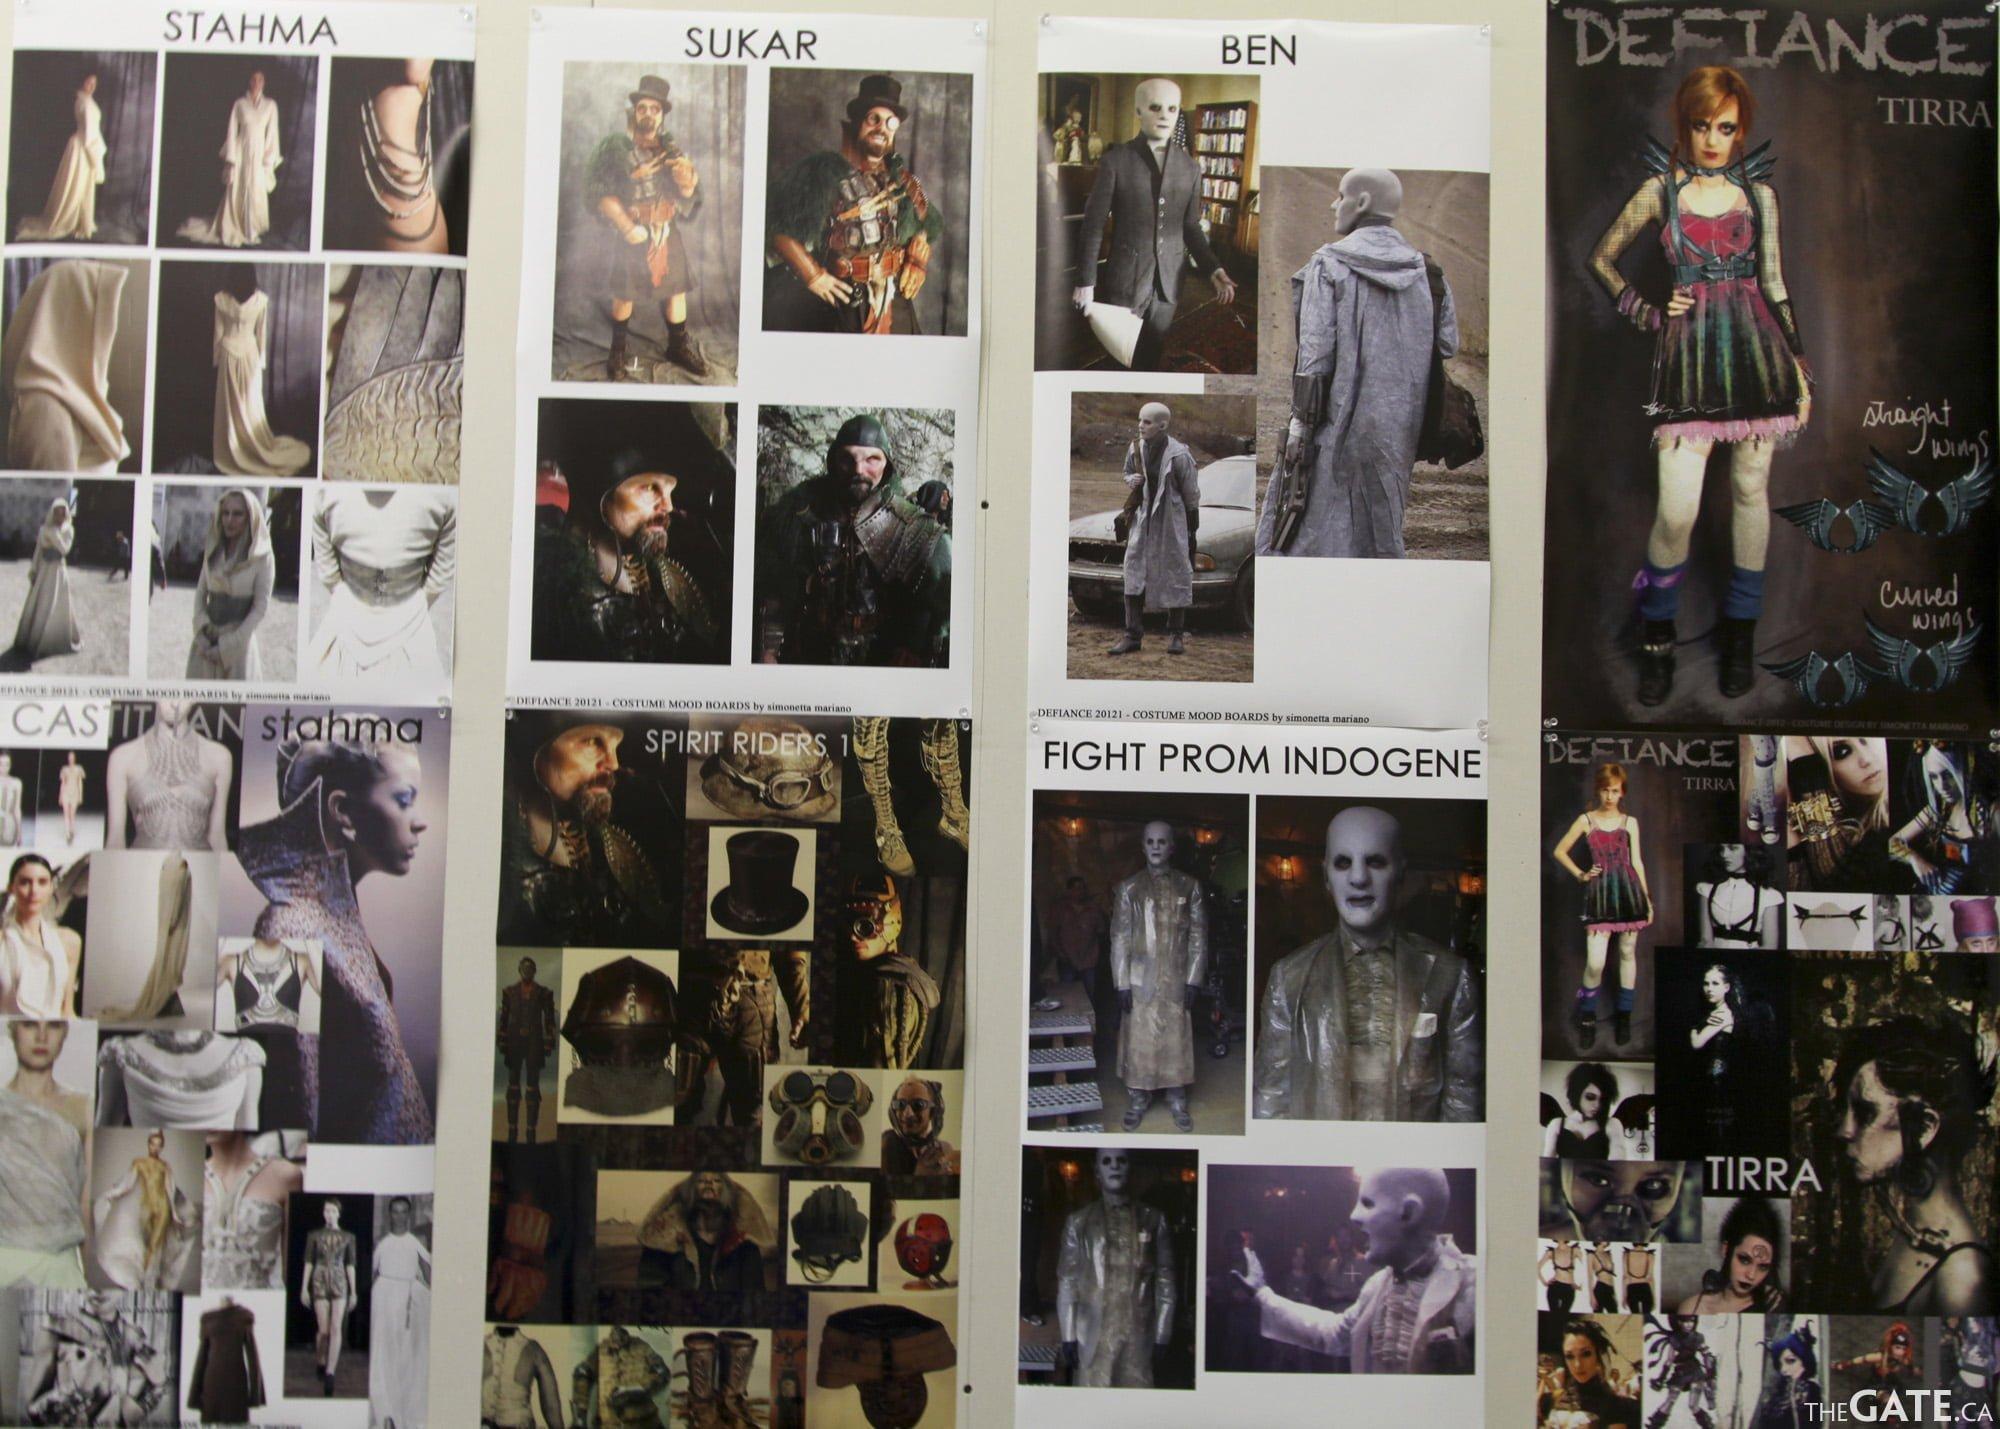 Costume test images - Ben, Tirra